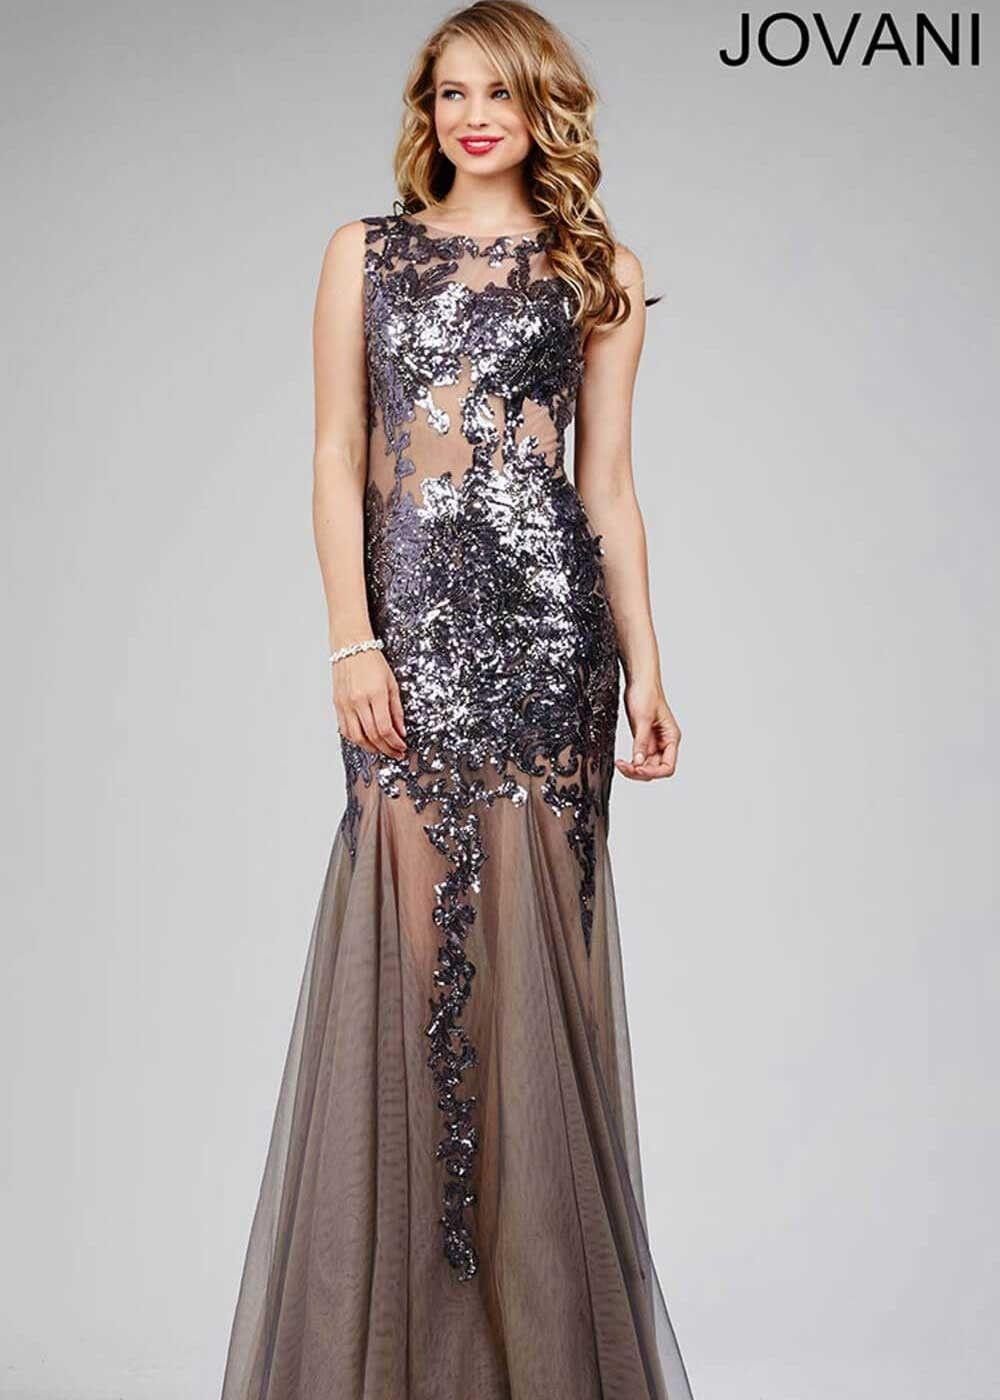 Jovani 24551 Sparkling Sequin Illusion Prom Dress